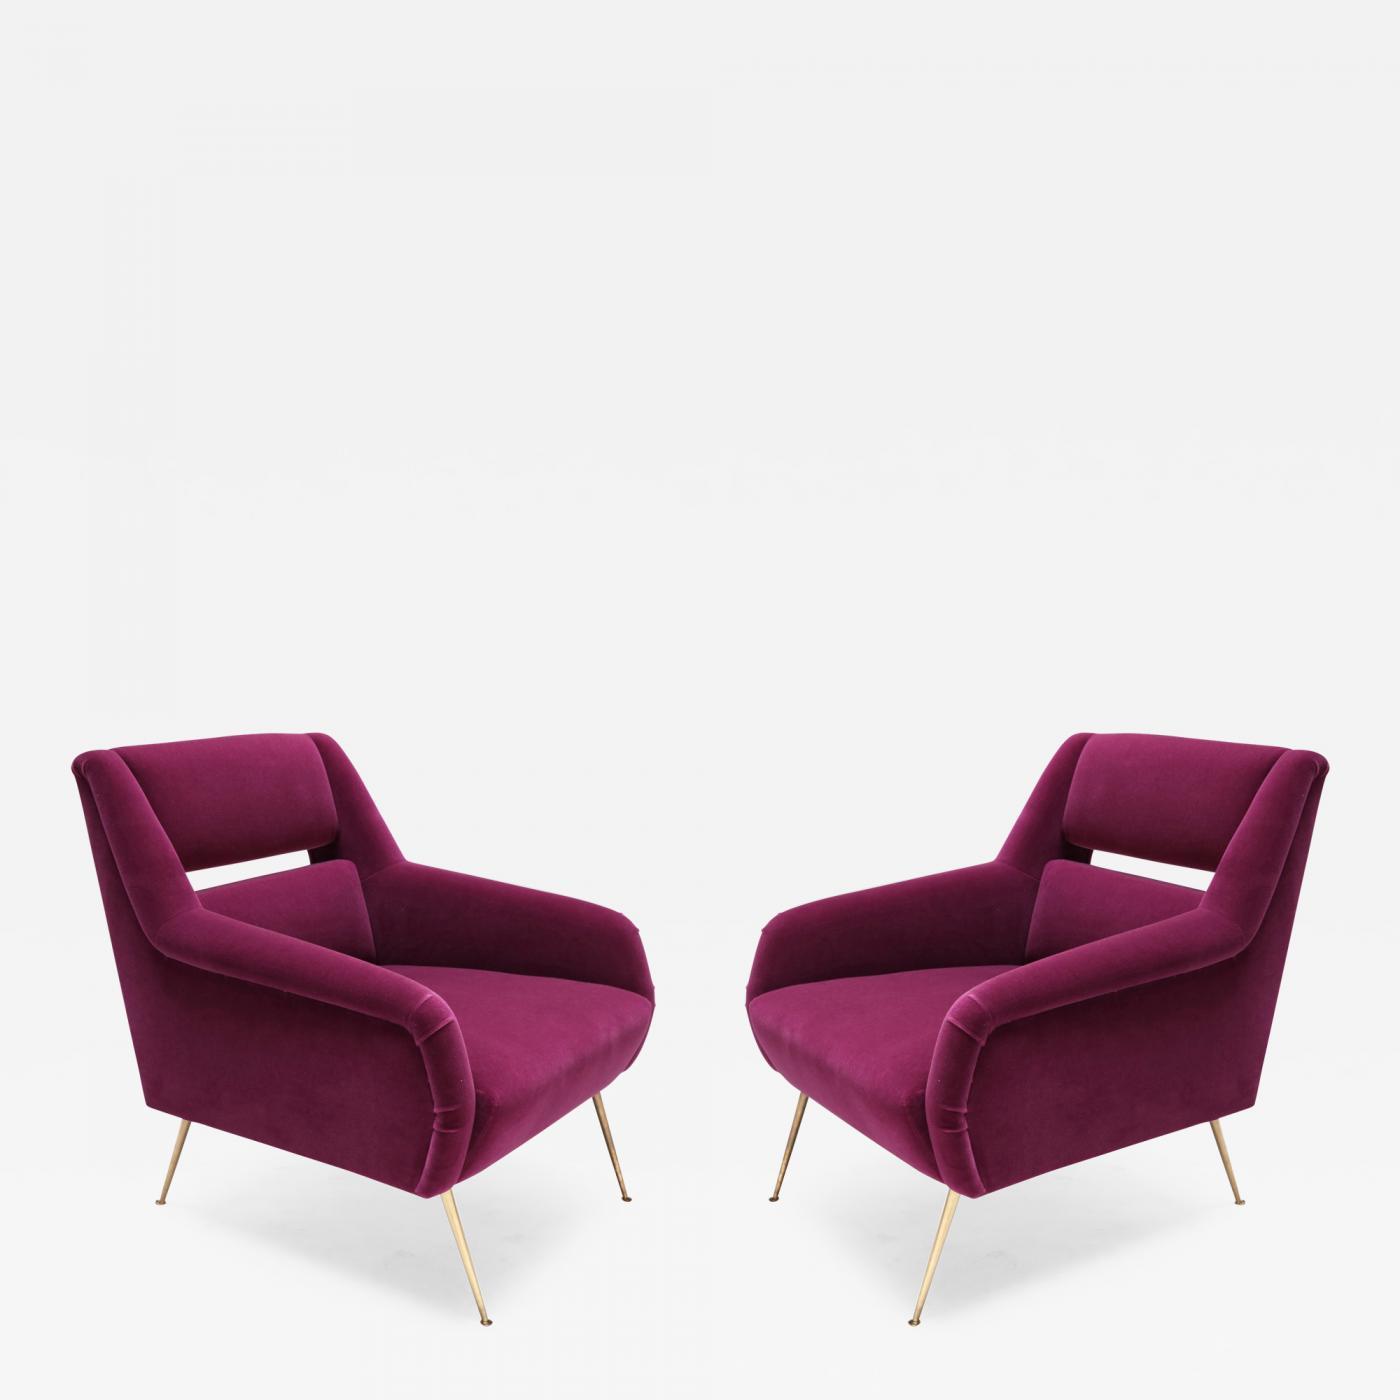 Pair of Custom 1960s Italian Style Armchairs in Fuchsia Mohair